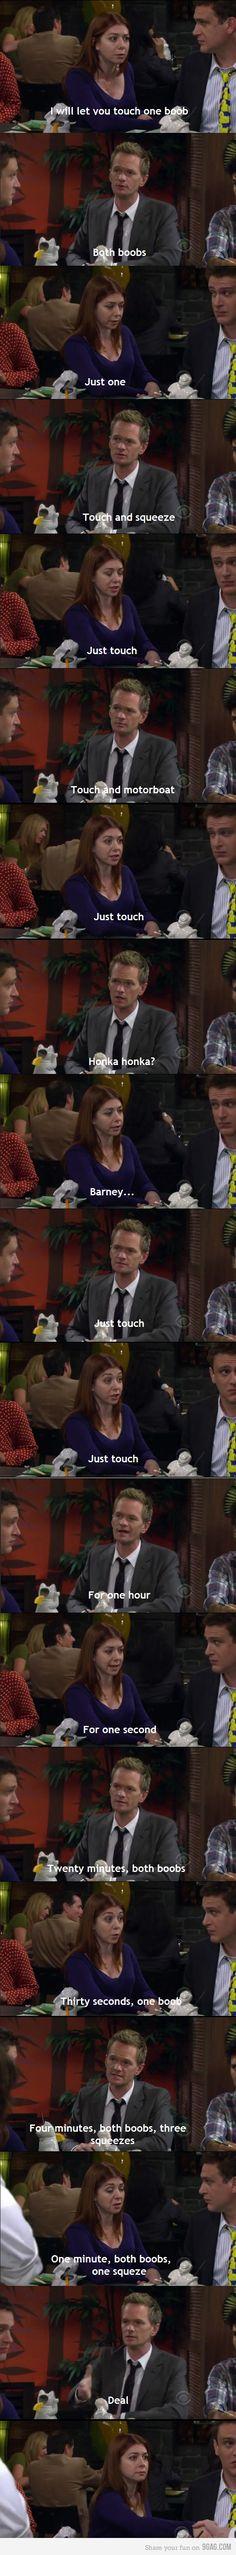 Just Barney.